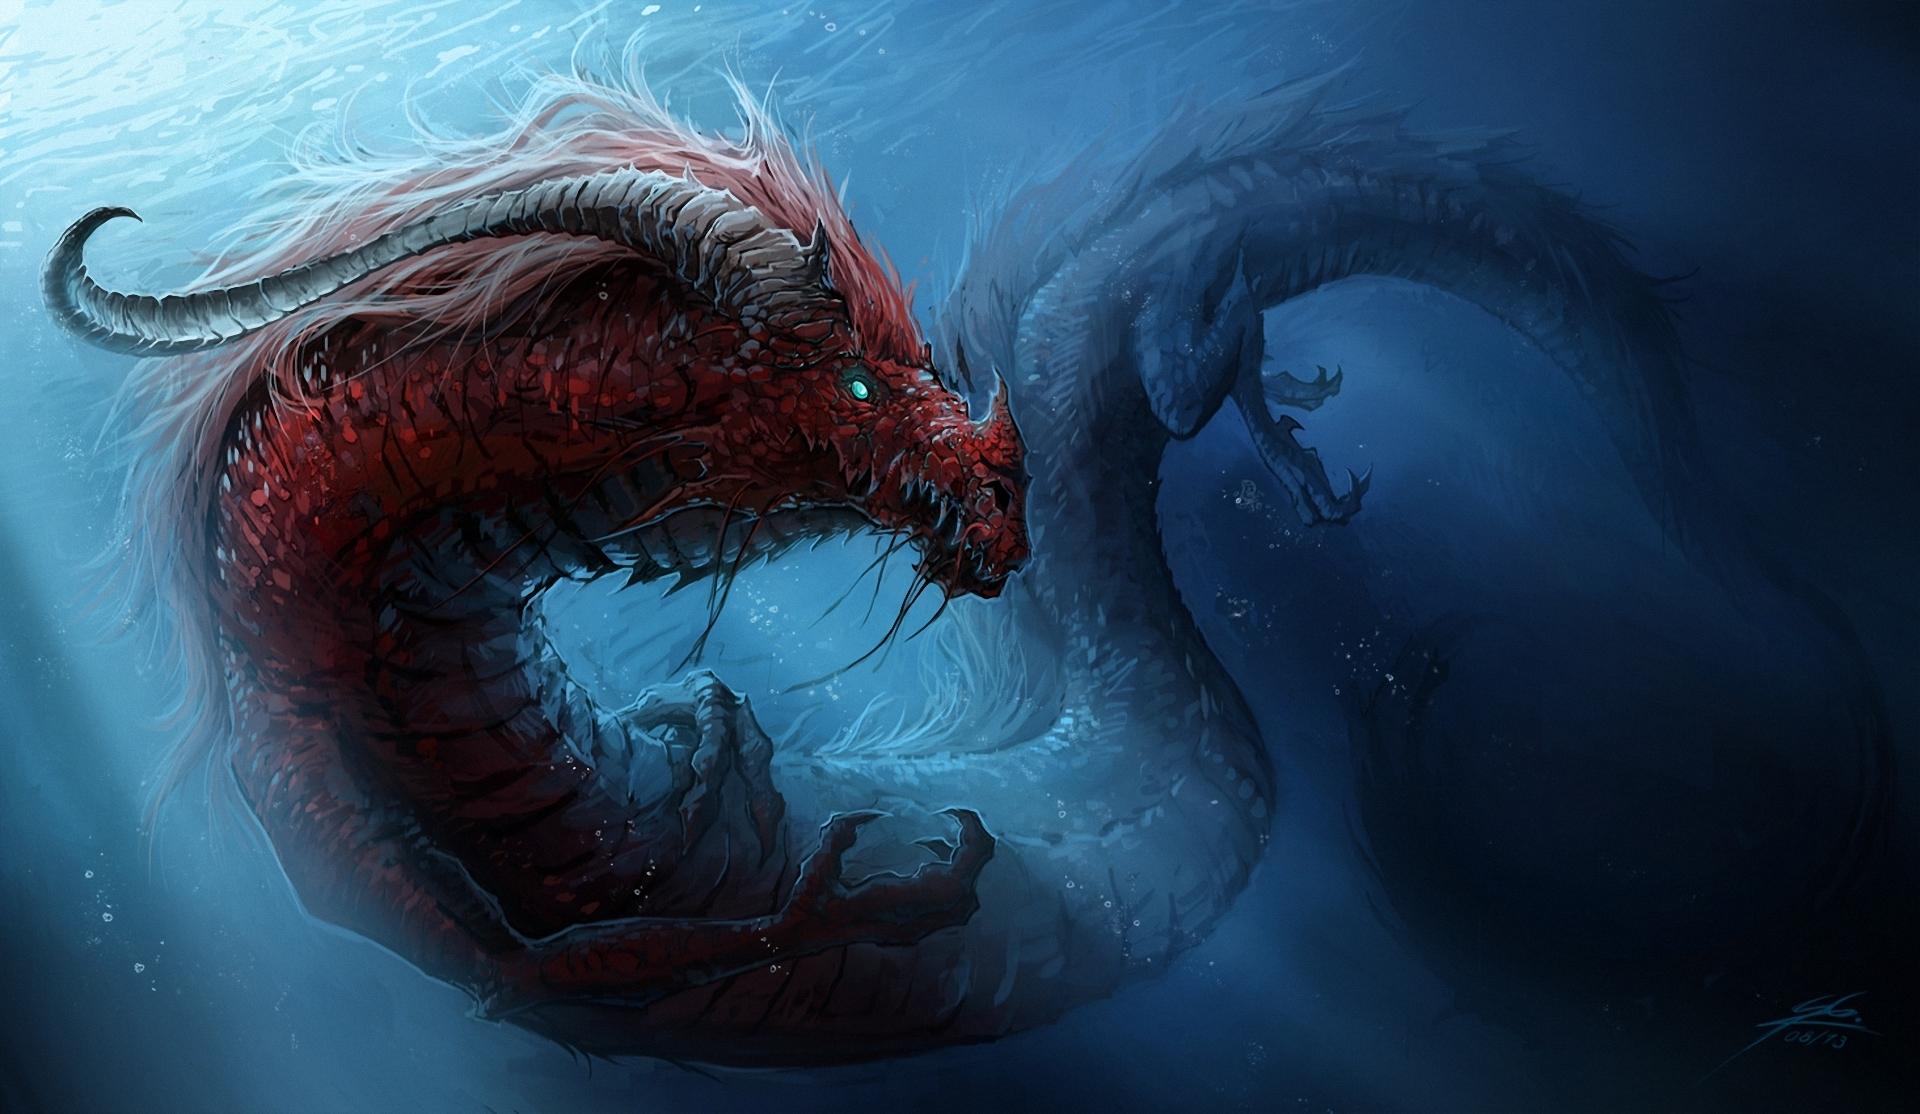 Dragons Underwater world Chinese dragon wallpaper 1920x1114 133726 1920x1114